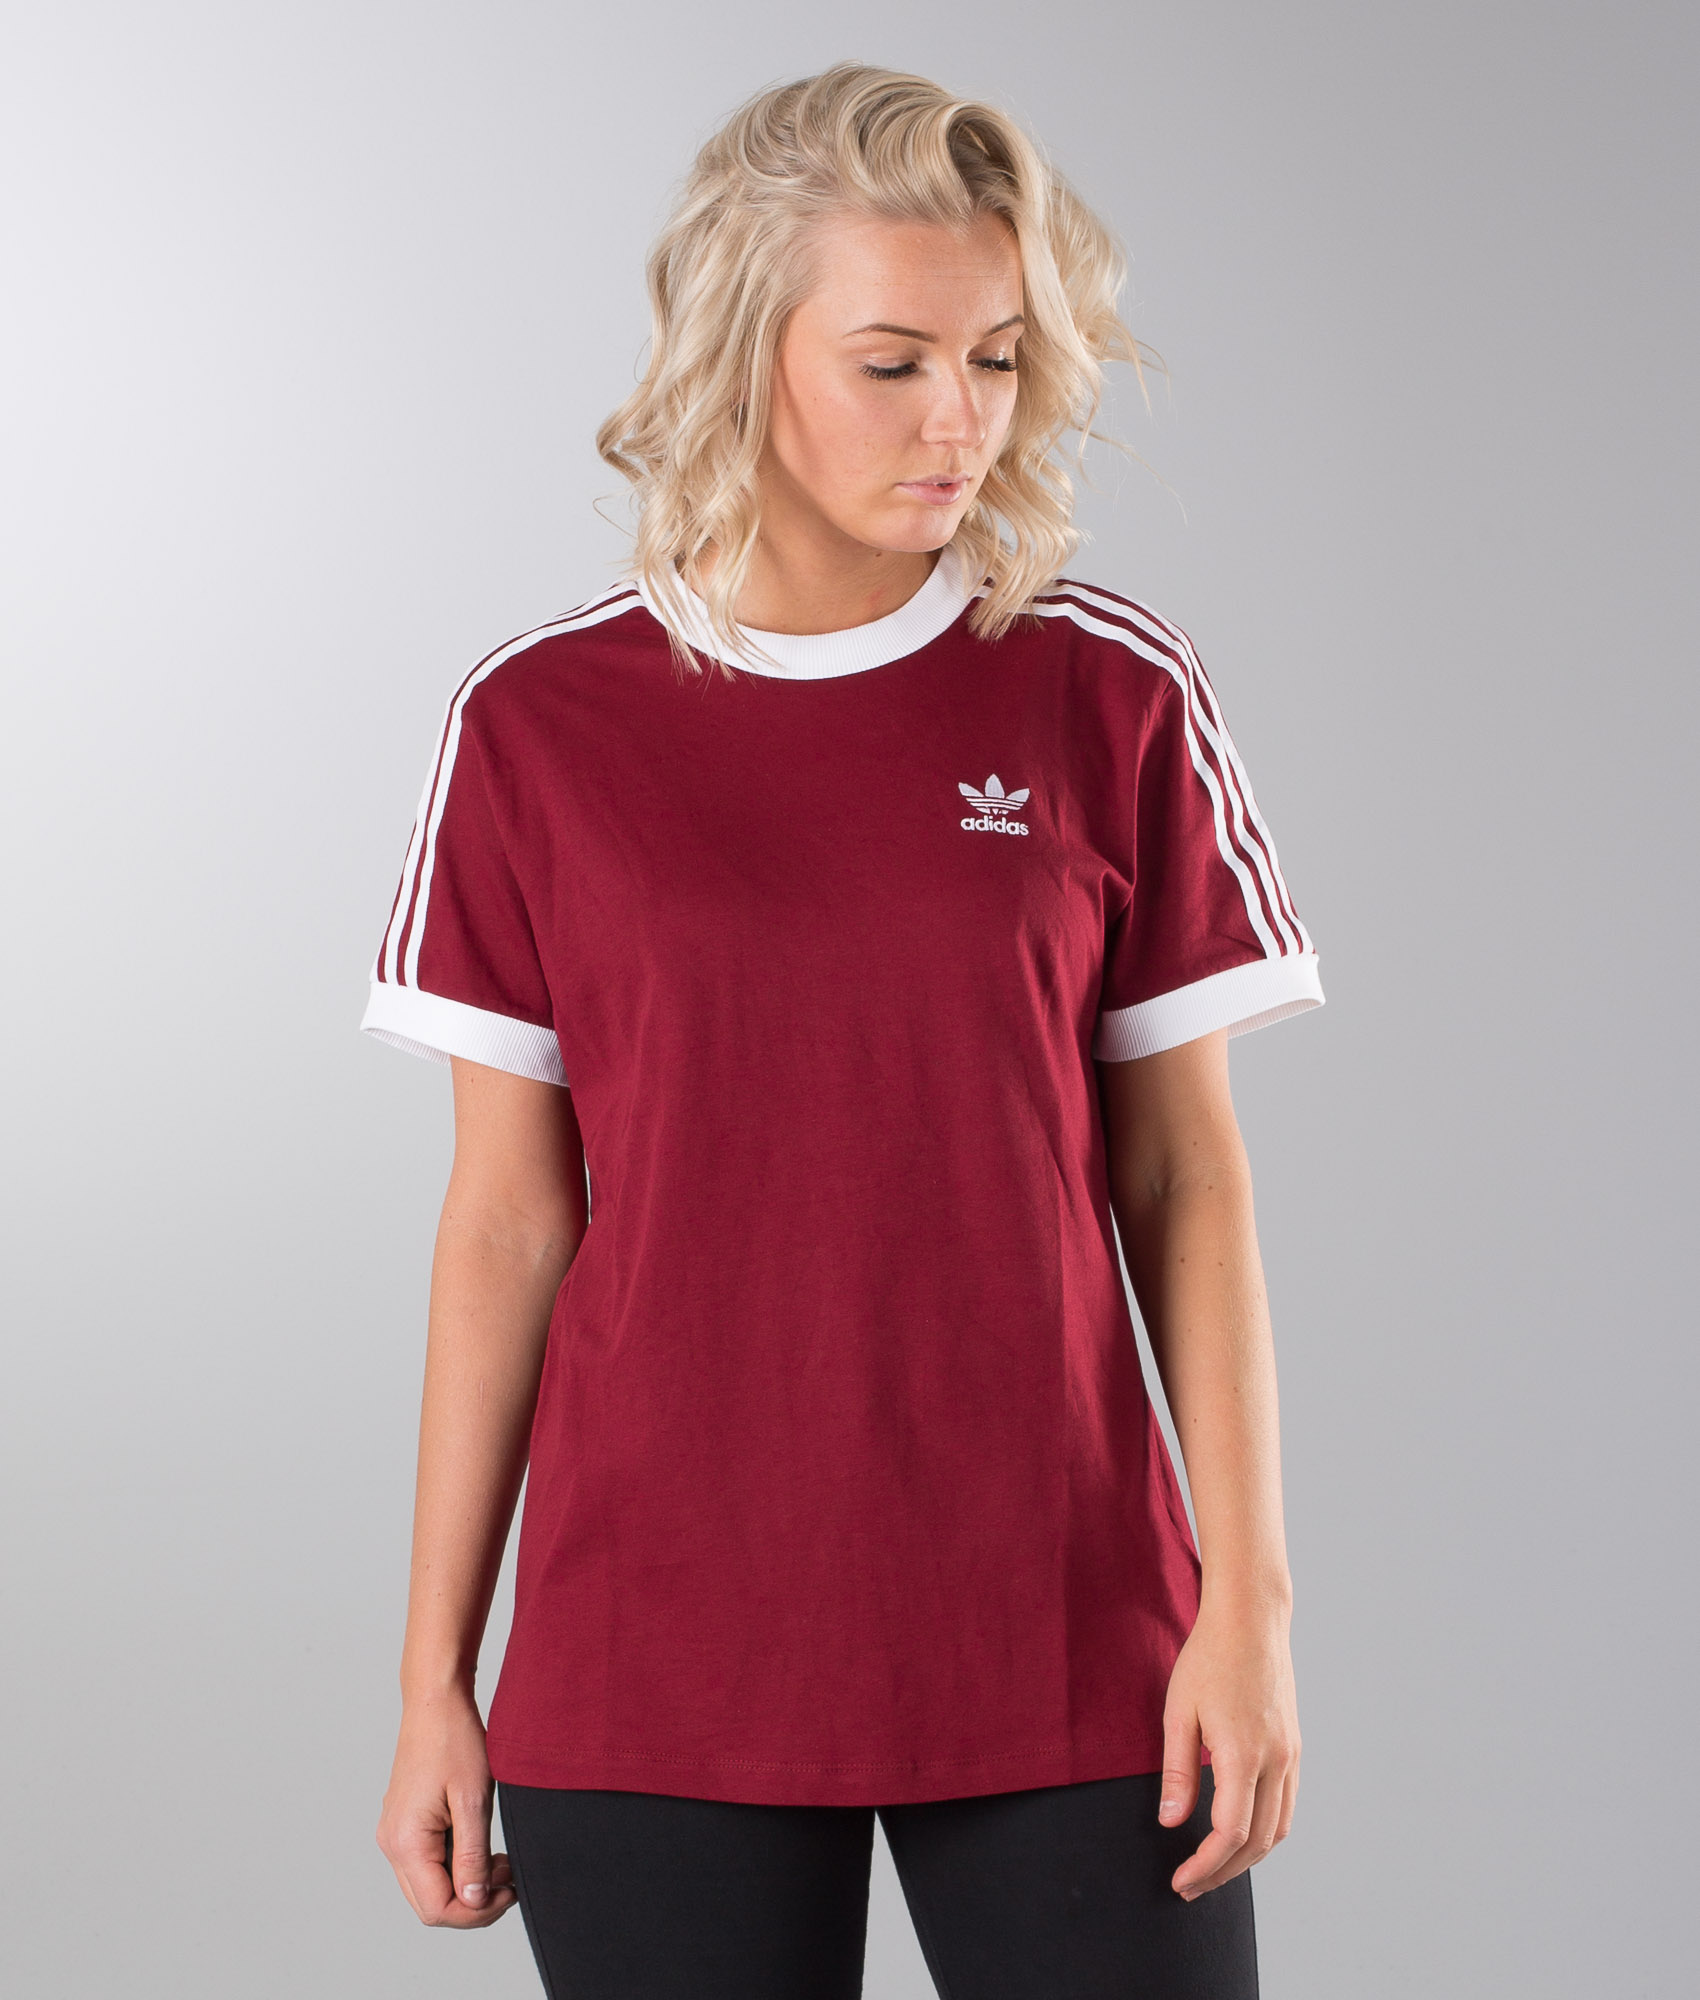 Stripes Burgundy Adidas Shirt T Collegiate Originals 3 0nPkOw